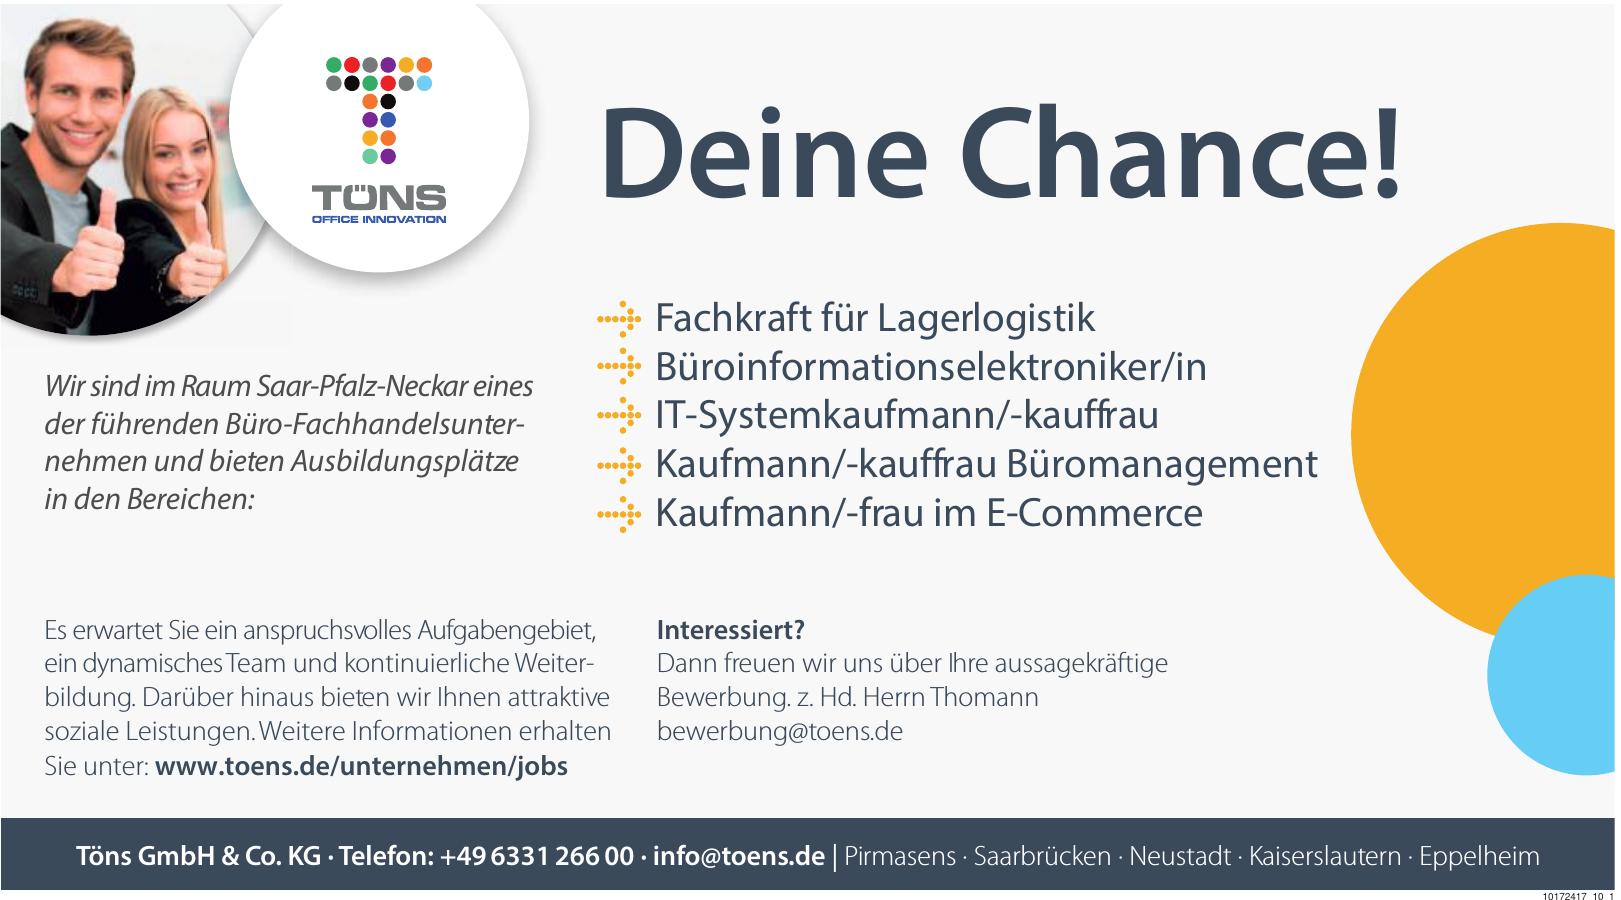 Töns GmbH & Co. KG